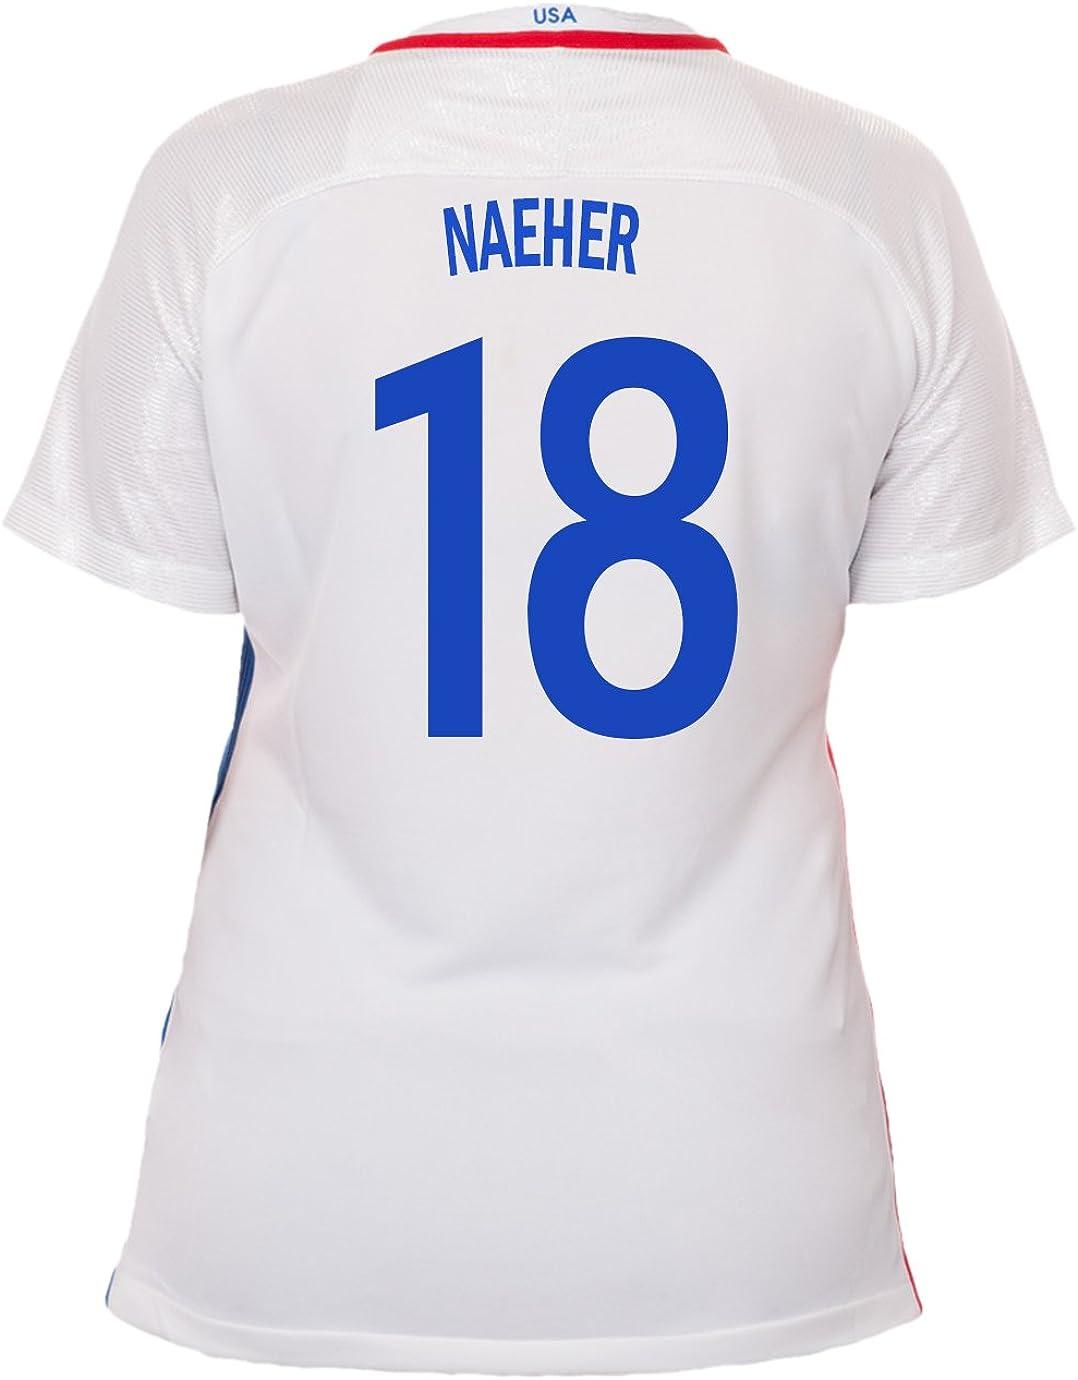 Nike Naeher #18 USA Home Soccer Jersey Rio 2016 Olympics Women's